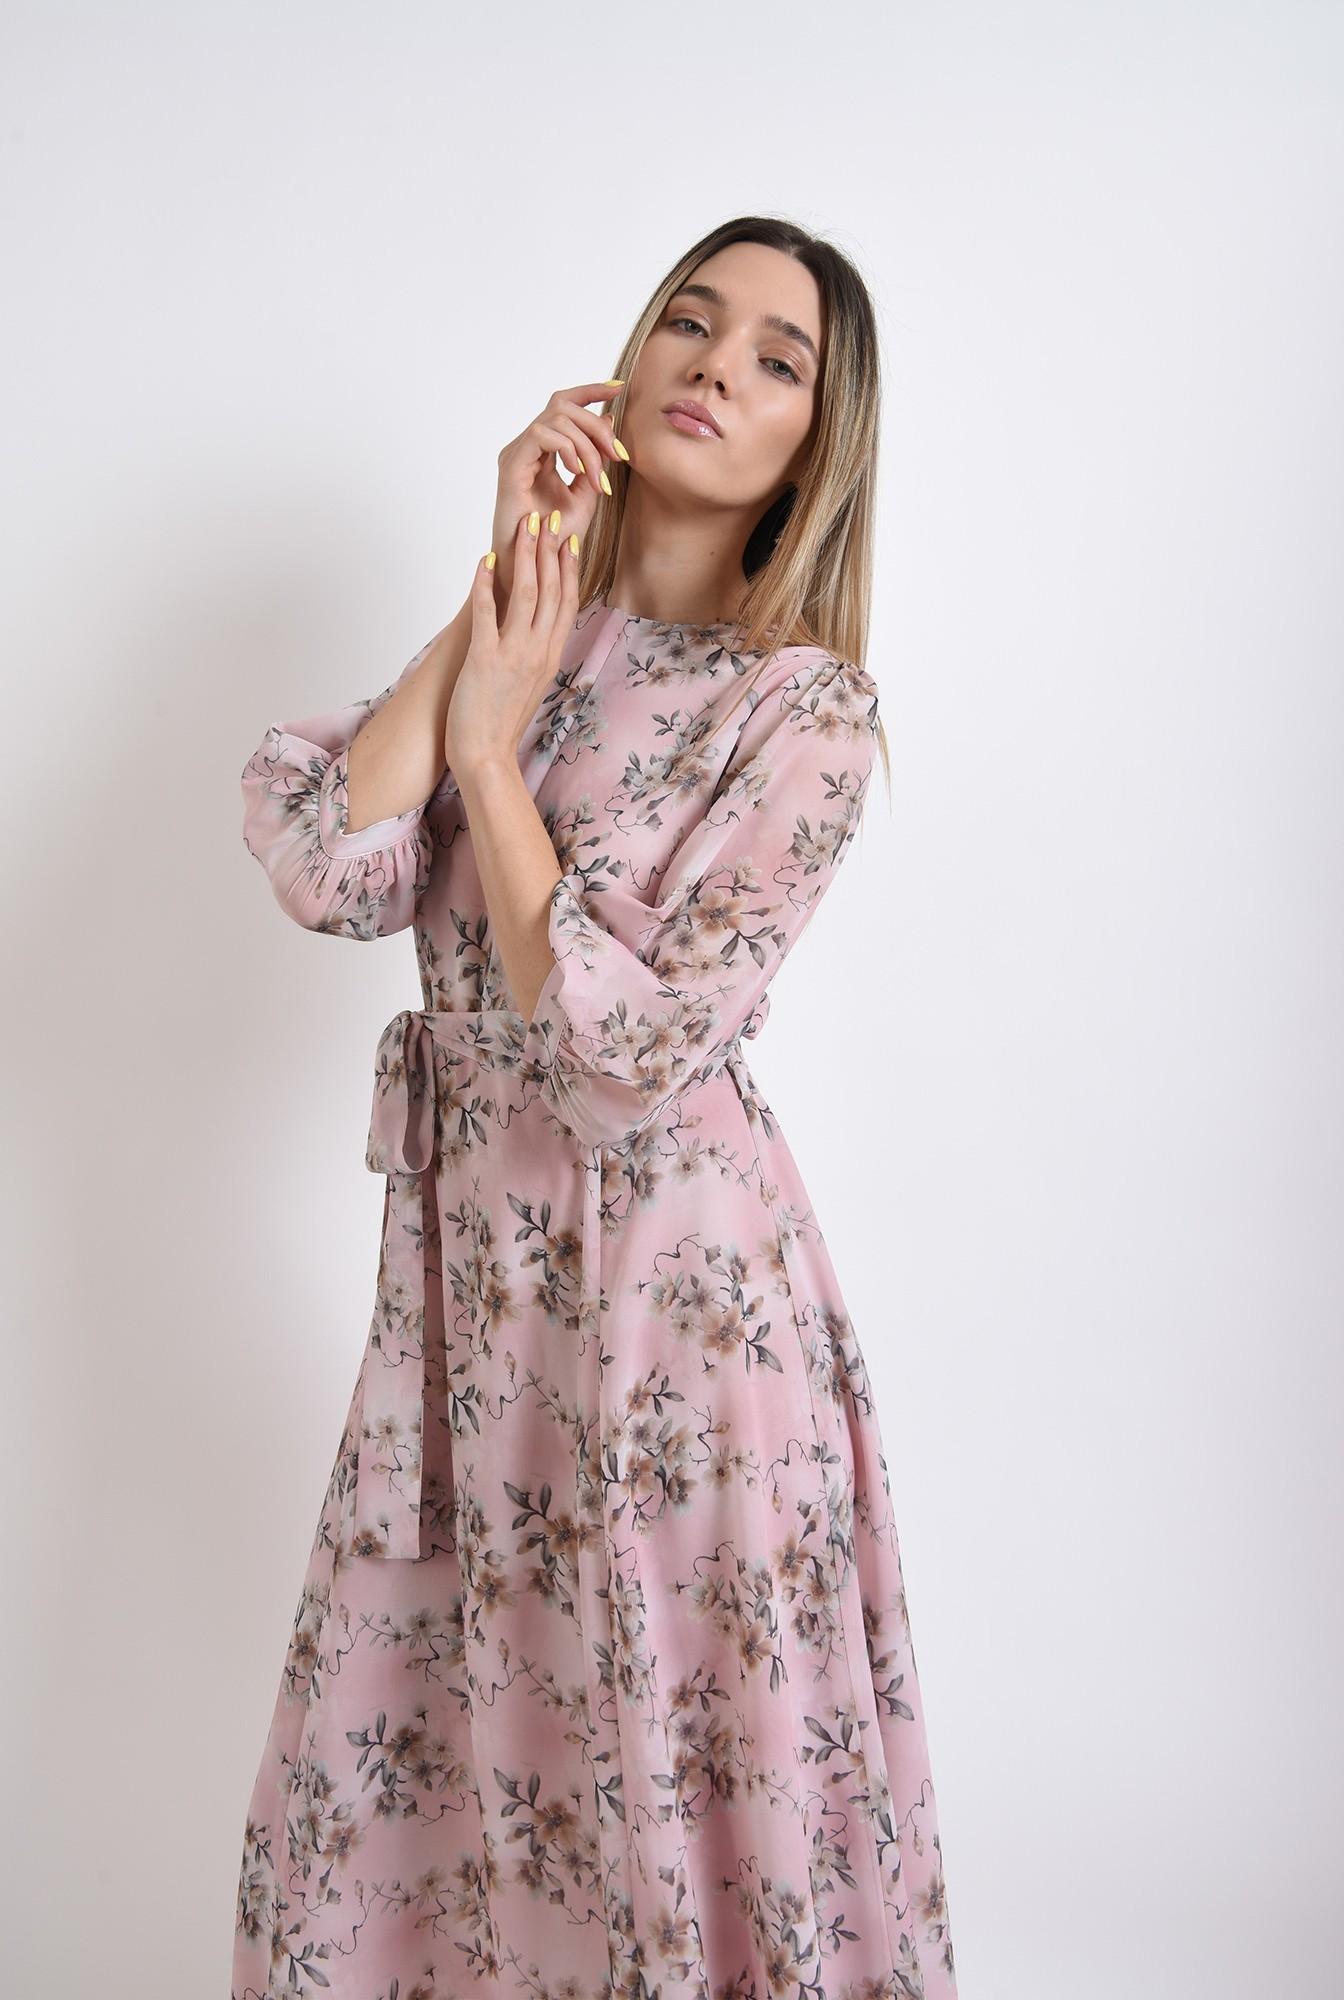 2 - rochie midi, evazata, roz, florala, eleganta